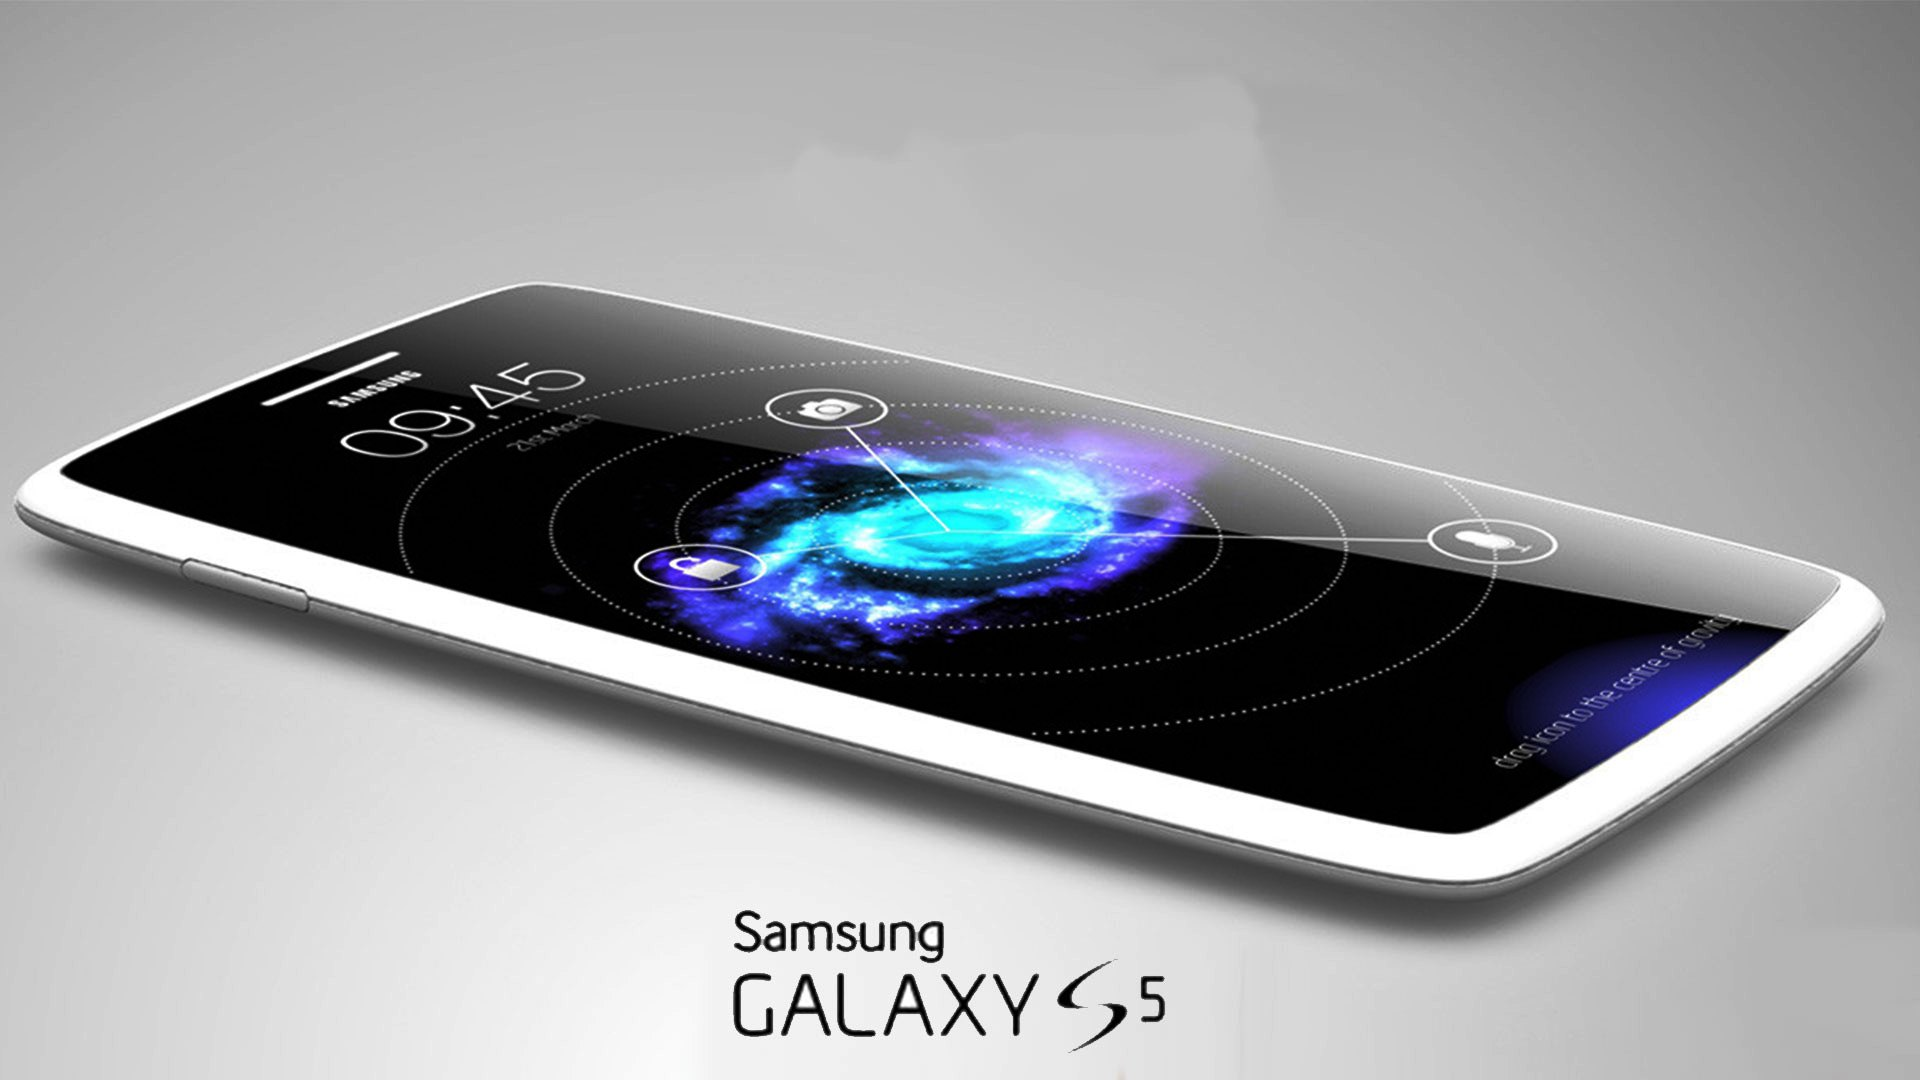 Samsung Galaxy S5 HD Walpapers 1920x1080